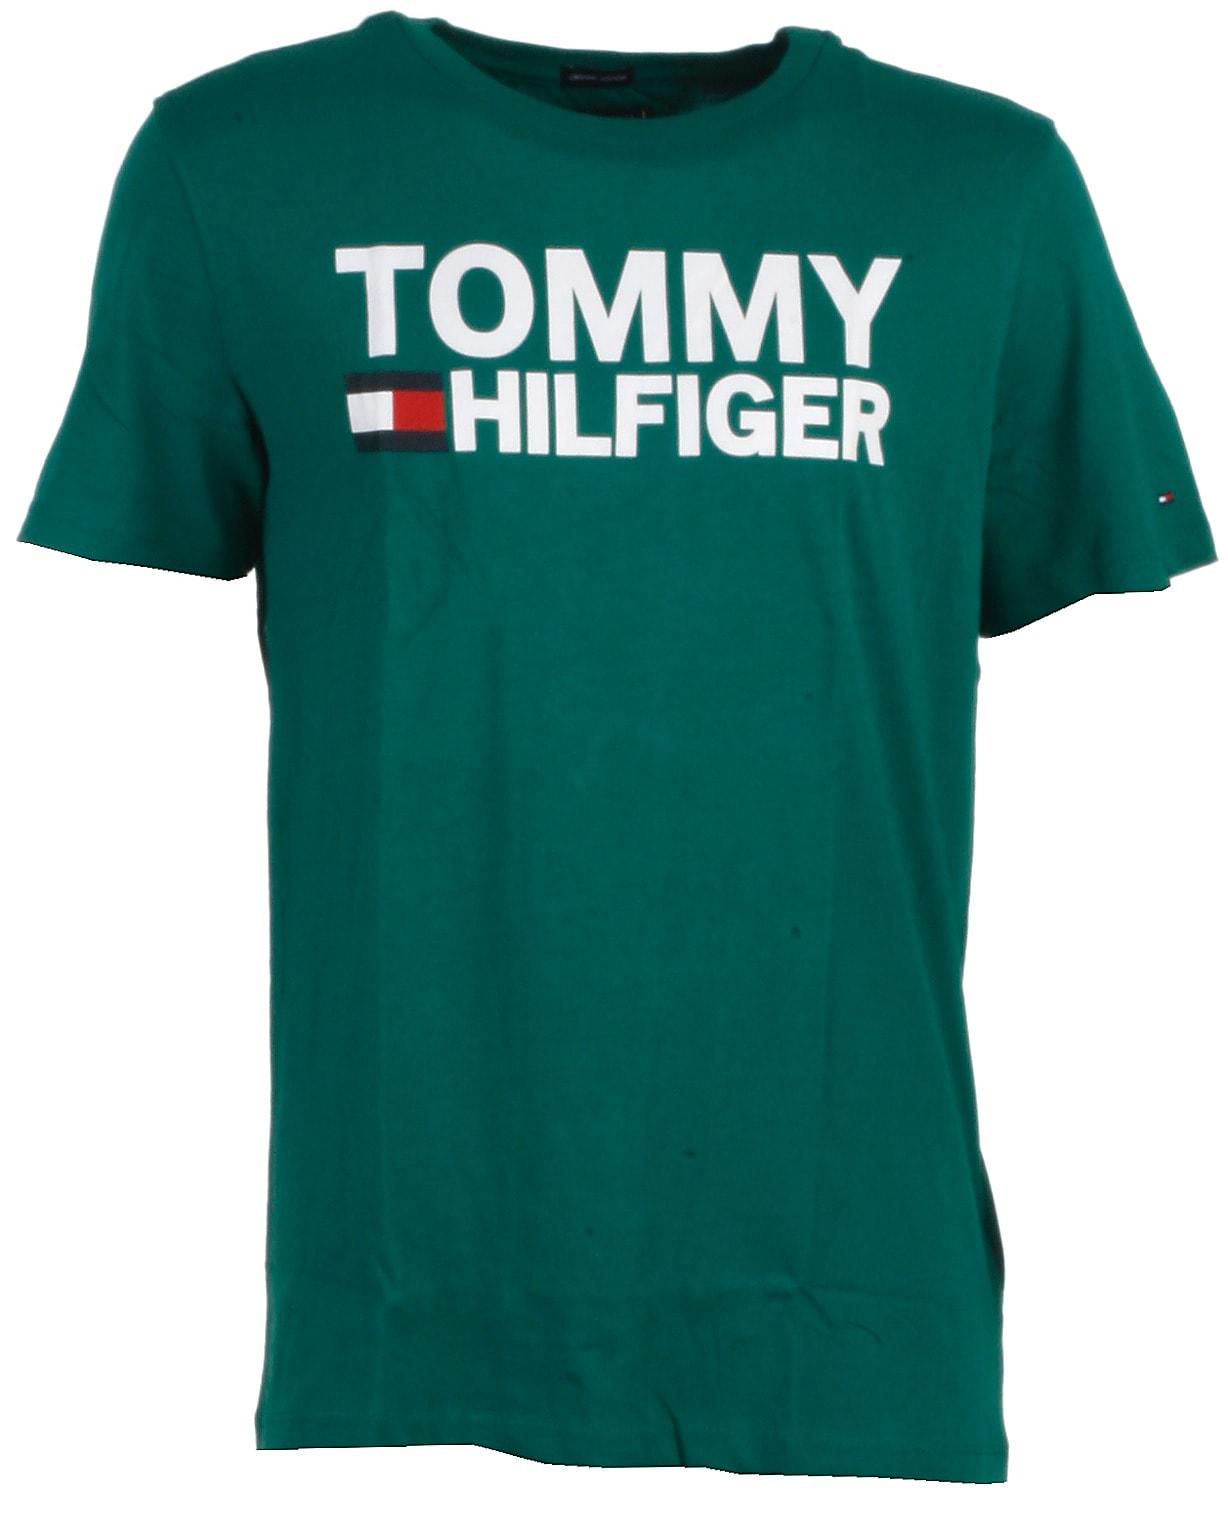 Tommy Hilfiger t-shirt s/s, grøn, Essential